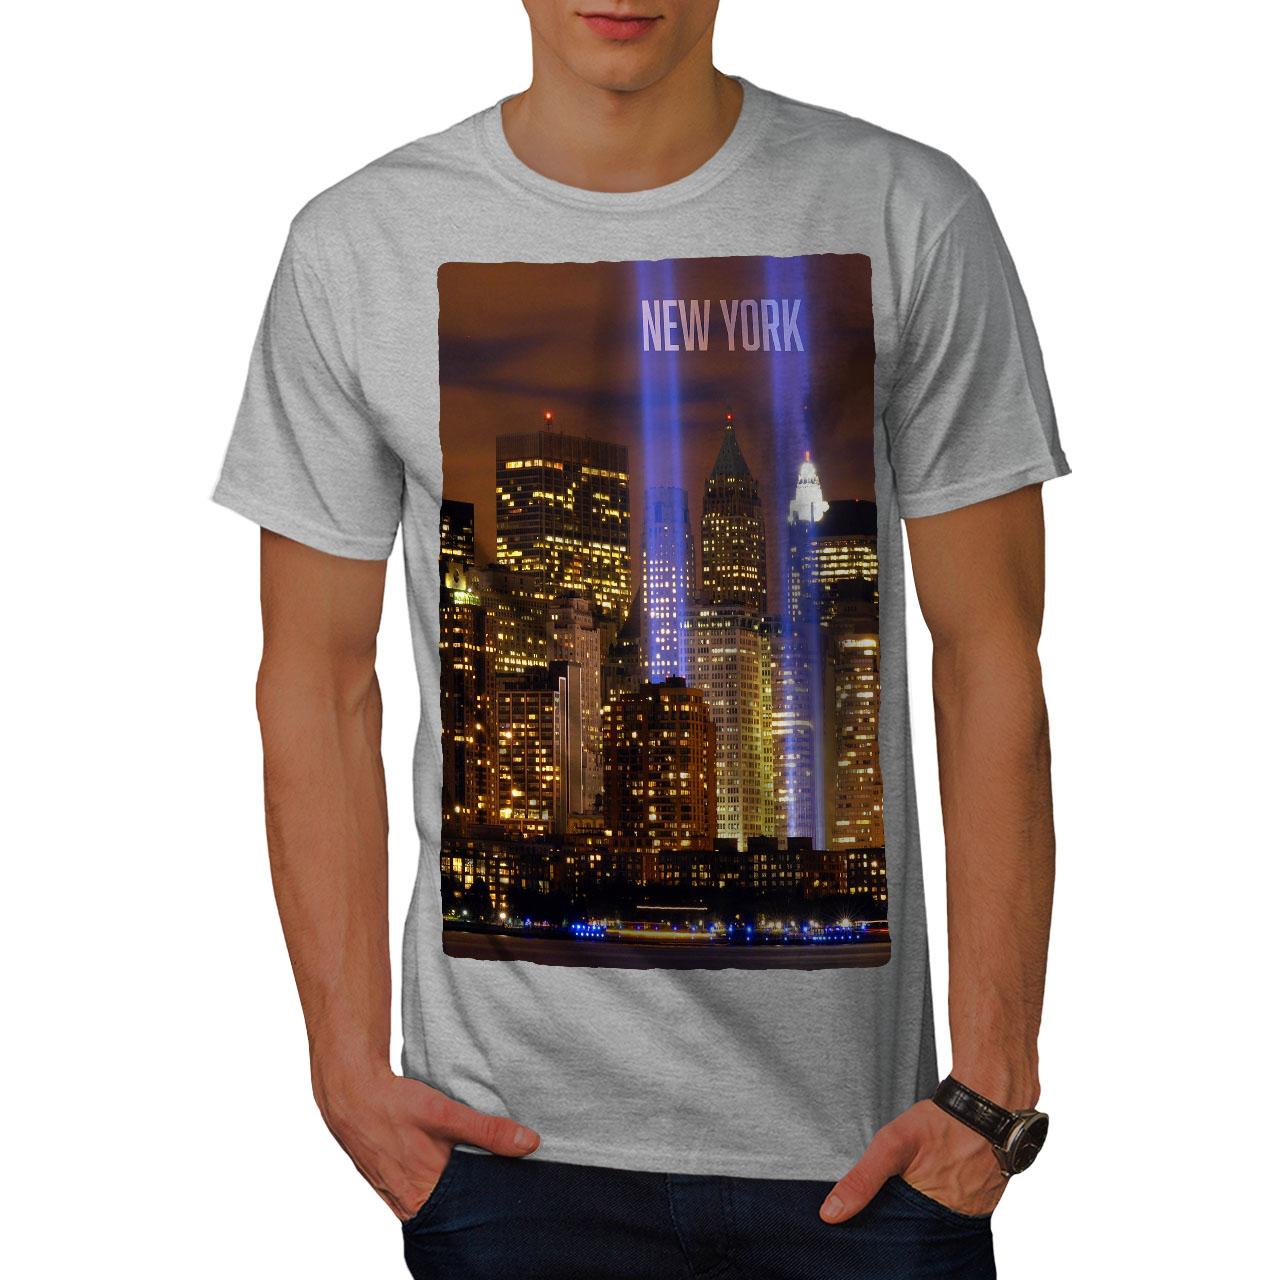 Wellcoda New York City Life Mens T Shirt Urban Art Graphic Design